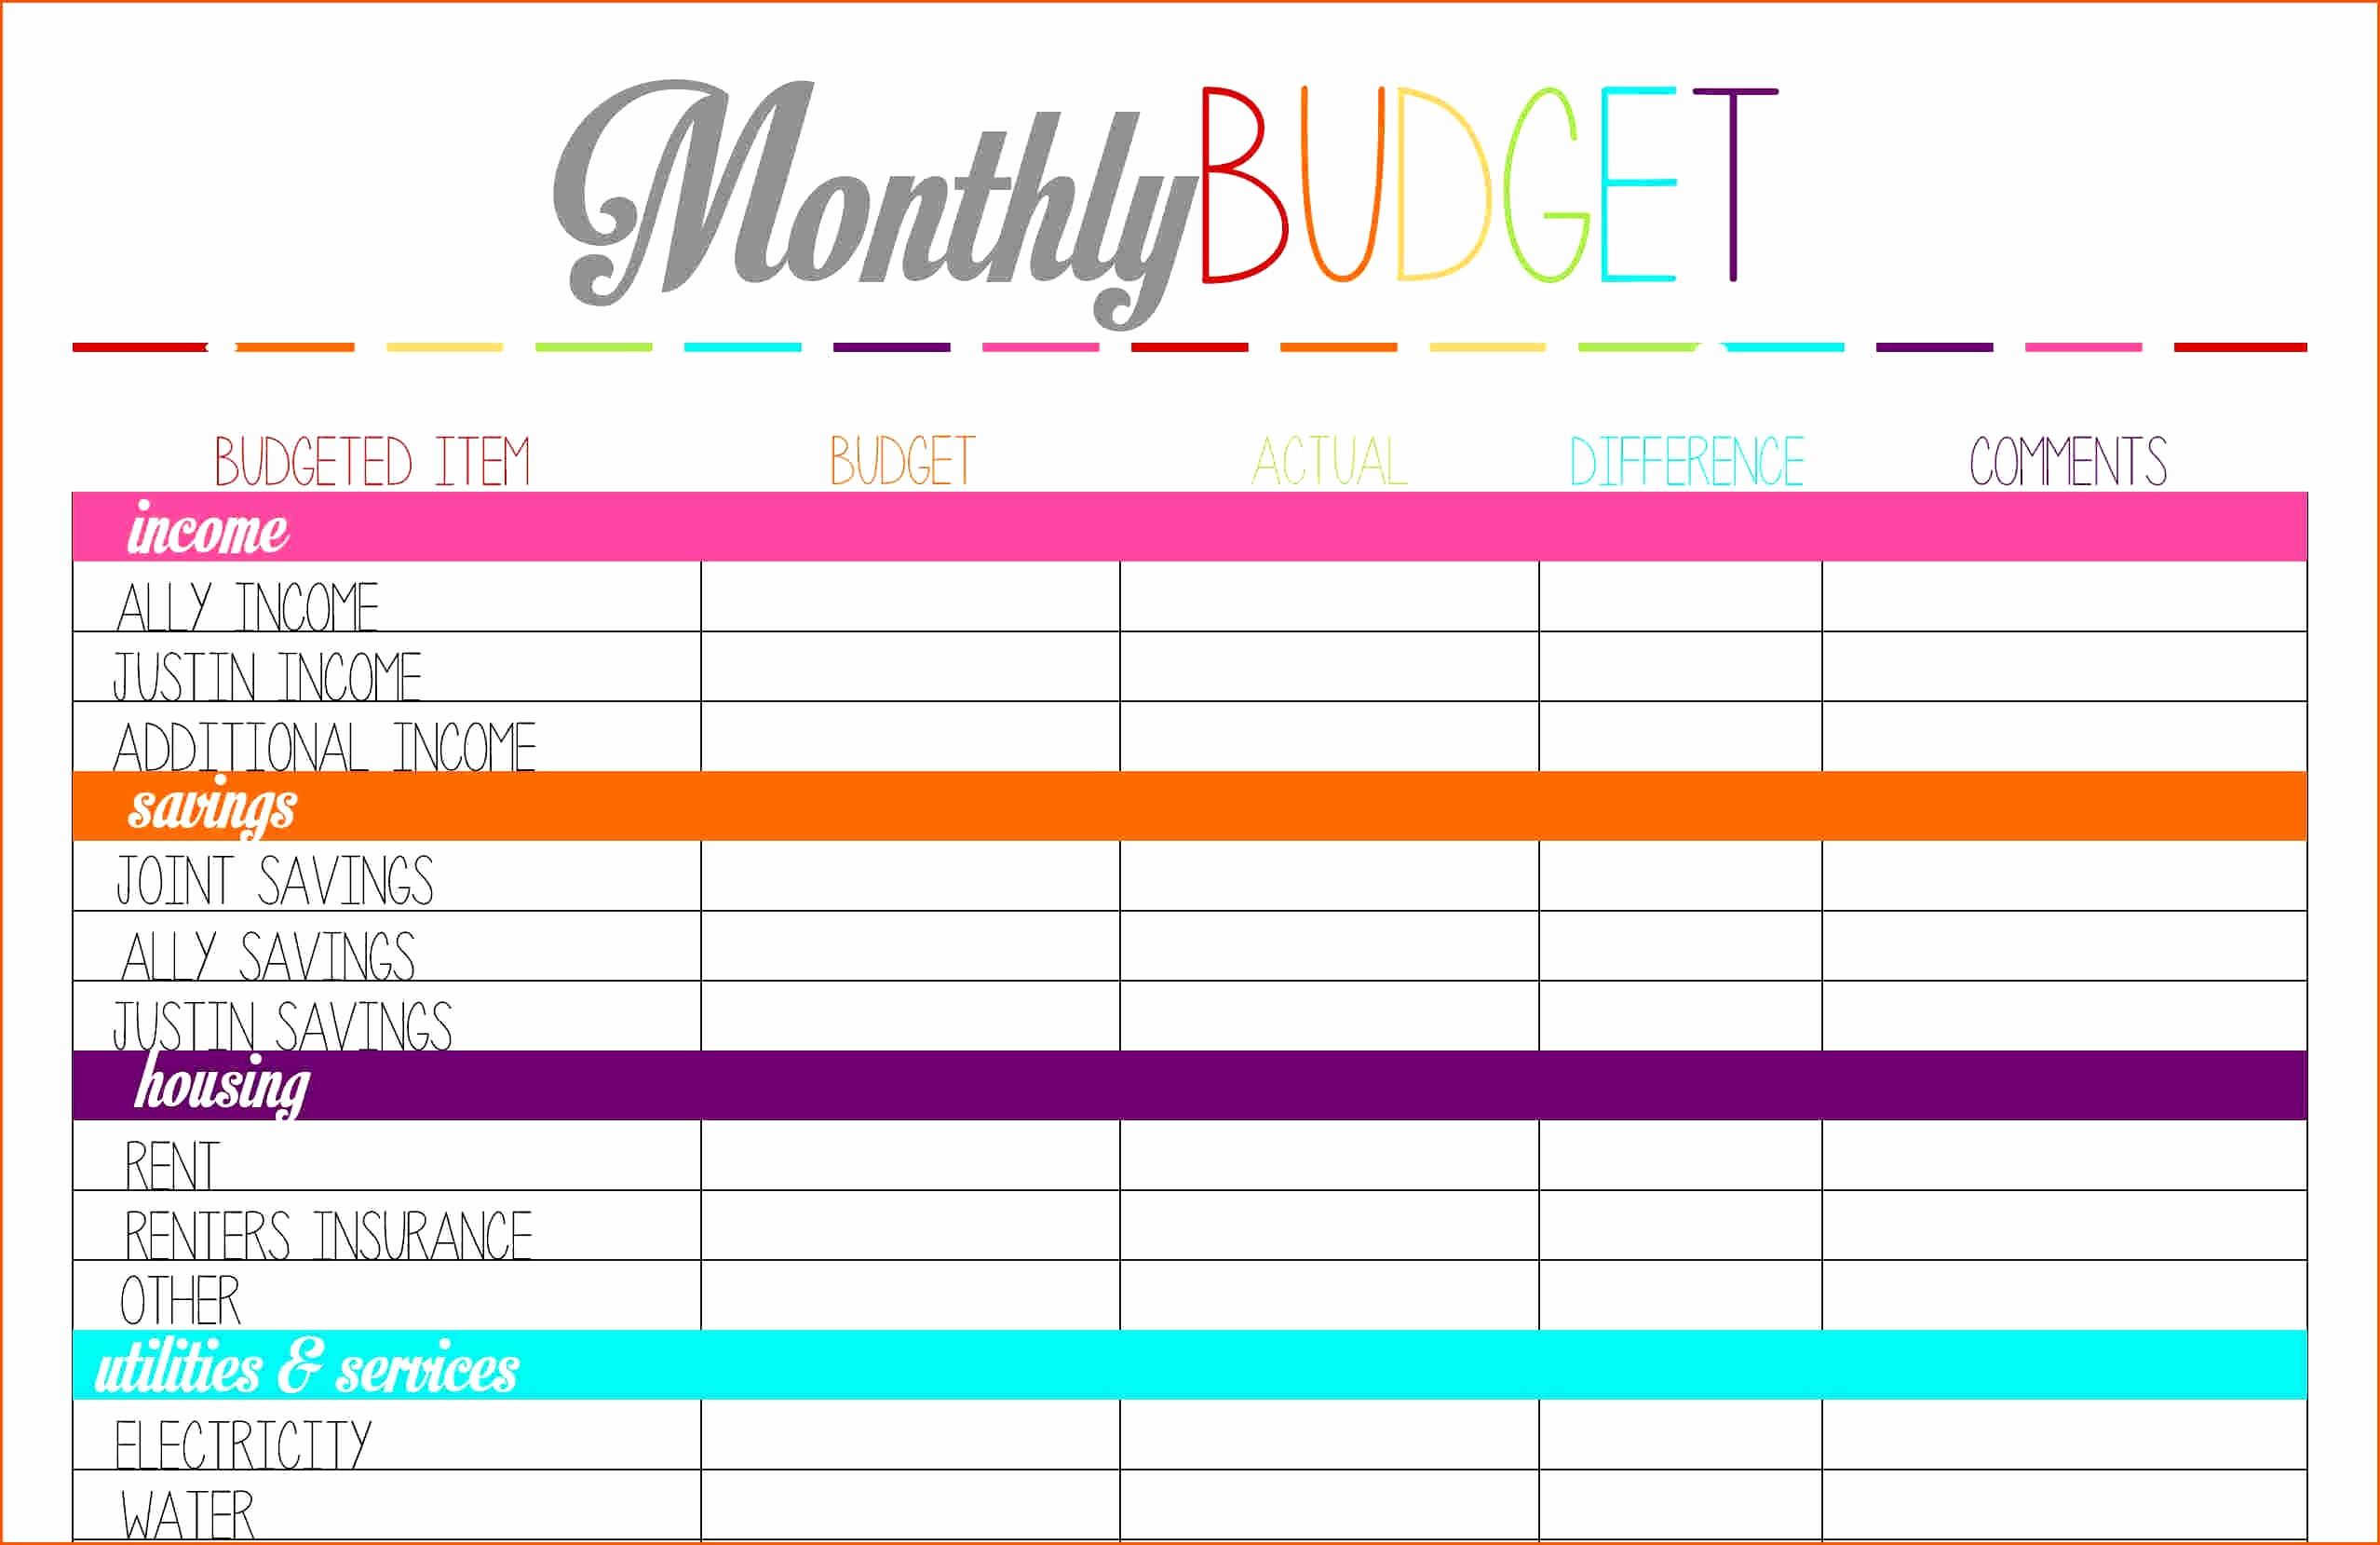 Zero Based Budget Spreadsheet Fresh Household Bud Spreadsheet Simple To How To Make A Household Budget Spreadsheet